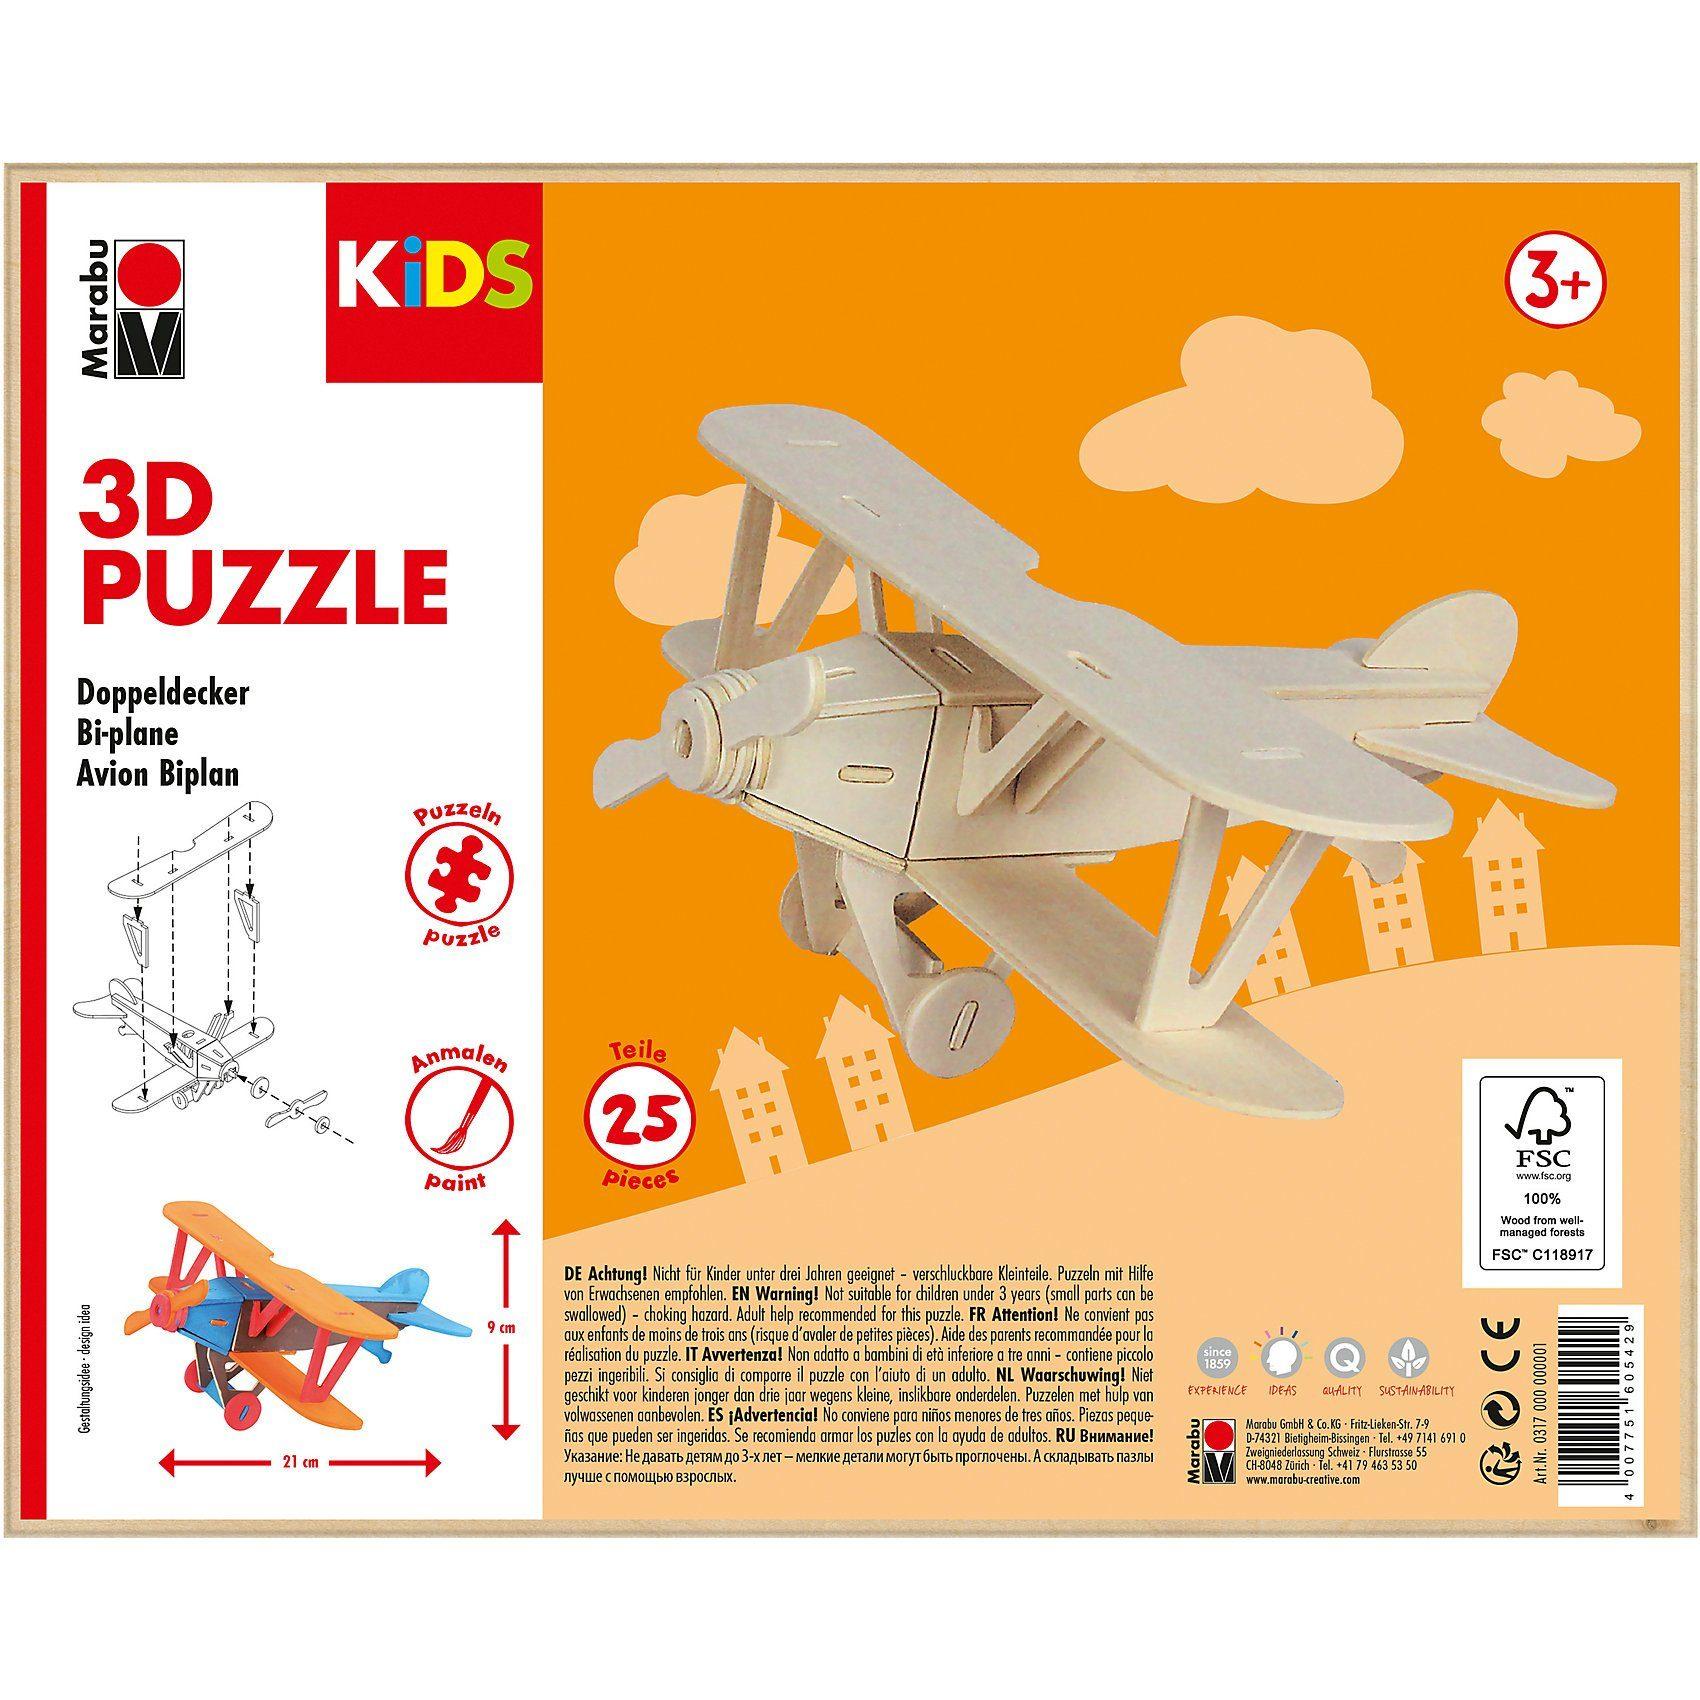 Marabu mara by 3D Puzzle Doppeldecker